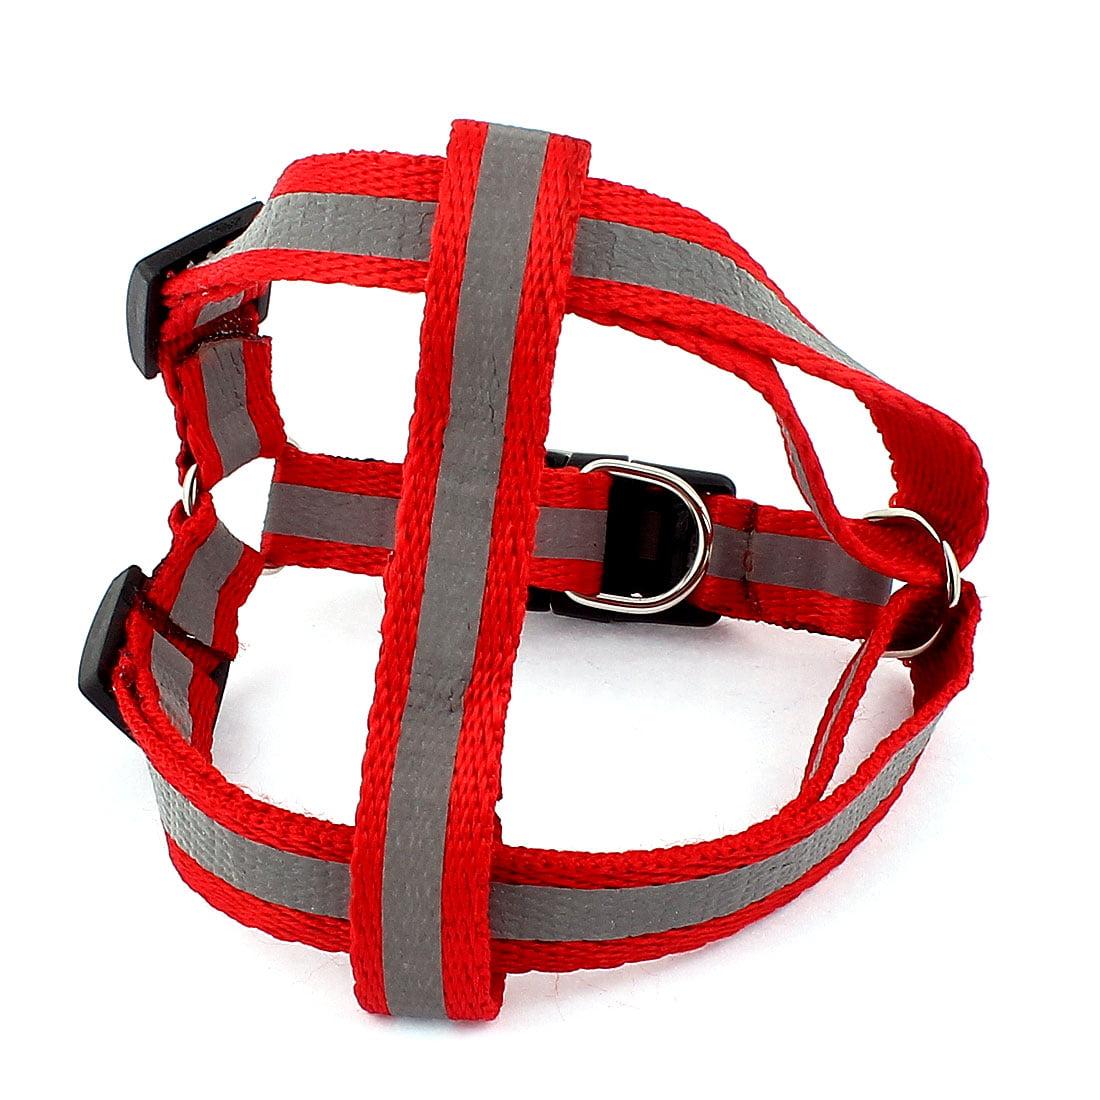 Unique Bargains Nylon Buckle Release Reflective Adjustable Pet Dog Harness Halter Leash Red